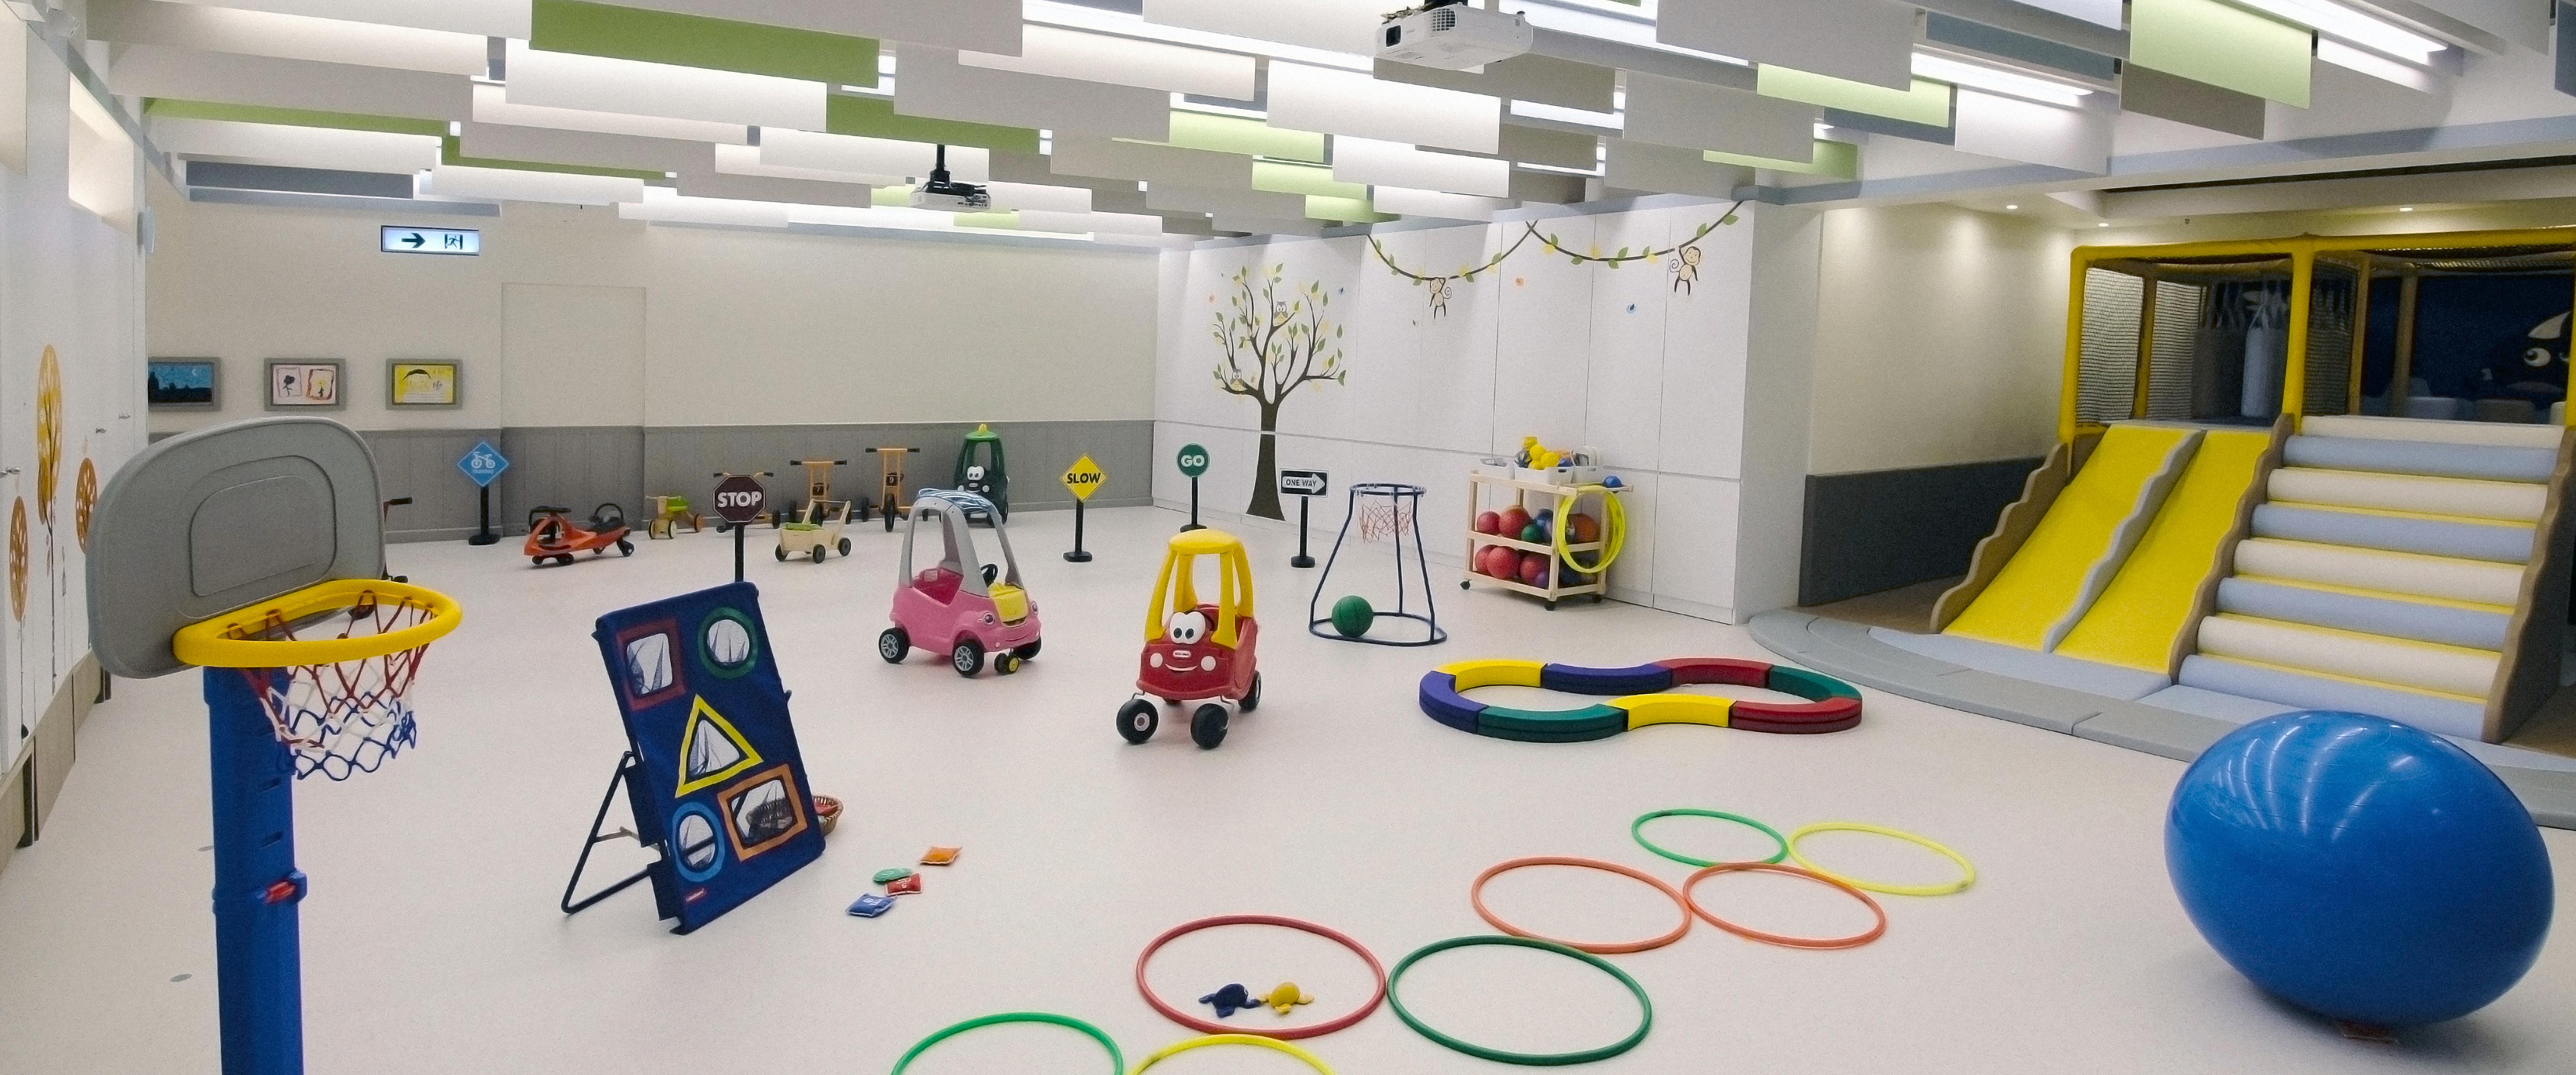 Harbour Green | Victoria Kindergarten, Nursery ,Infant & Toddler Programme